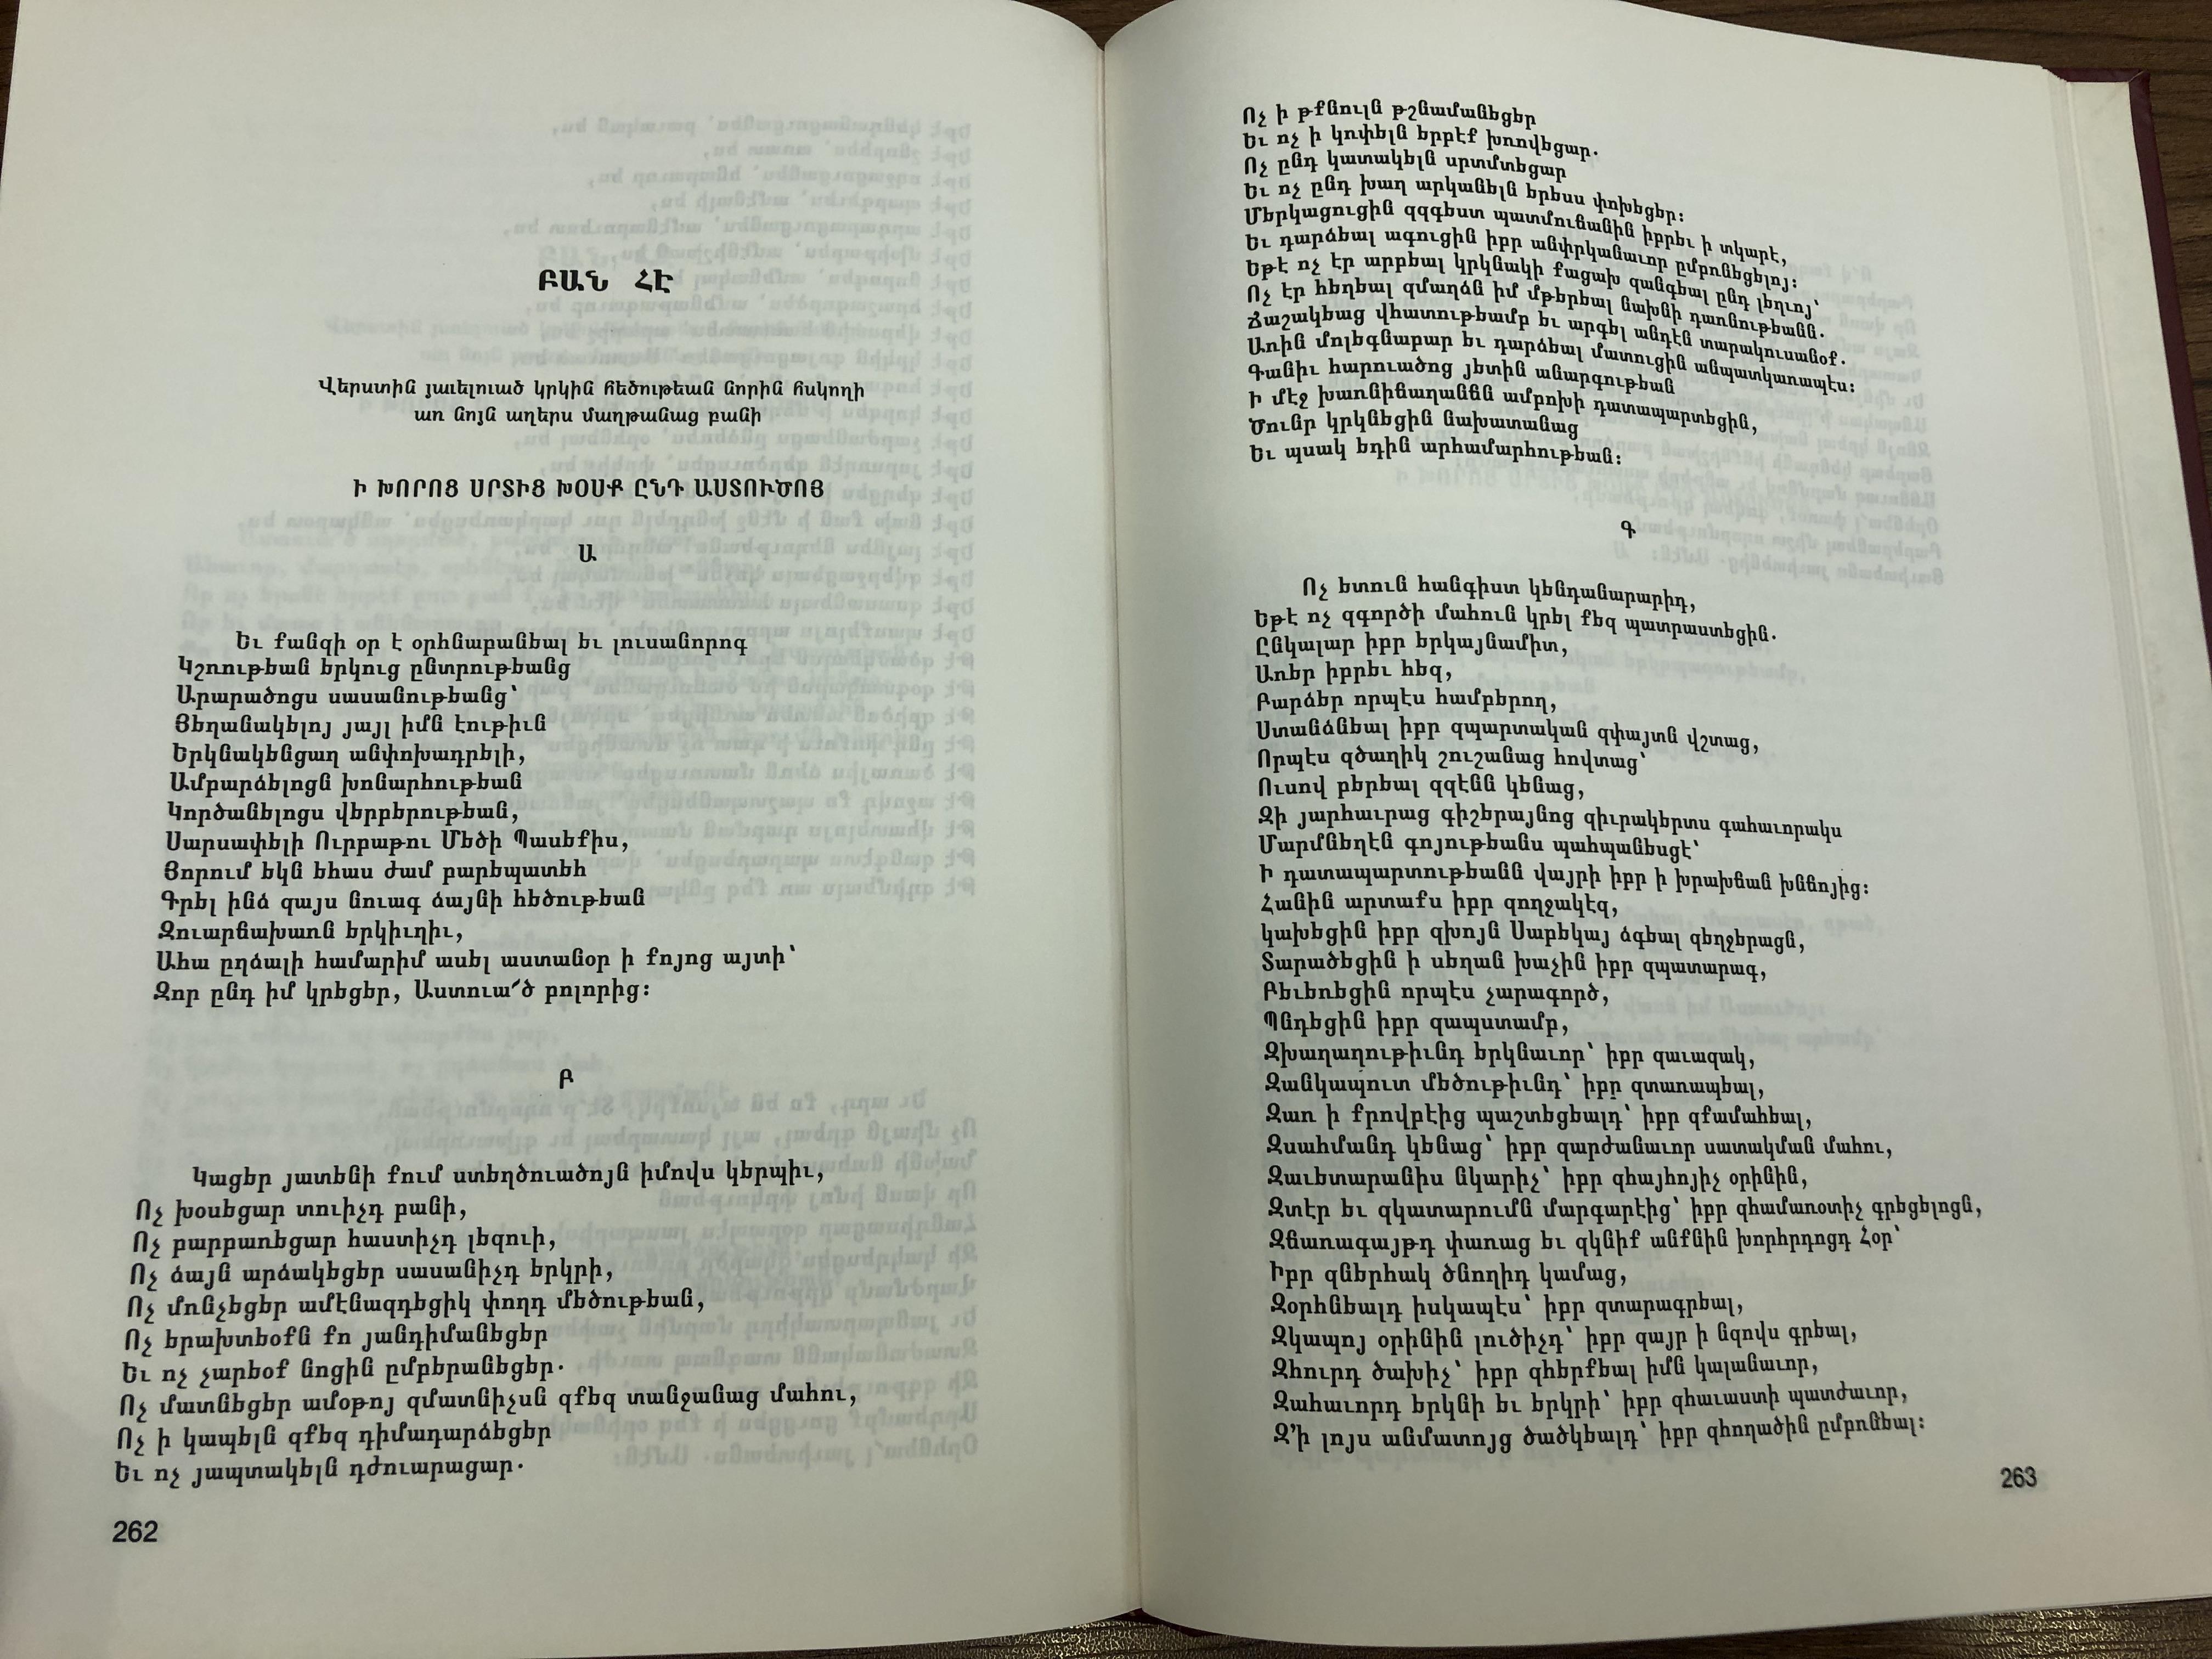 armenian-christian-prayer-book-daily-prayers-daily-devotionals-readings-hardcover-10-.jpg